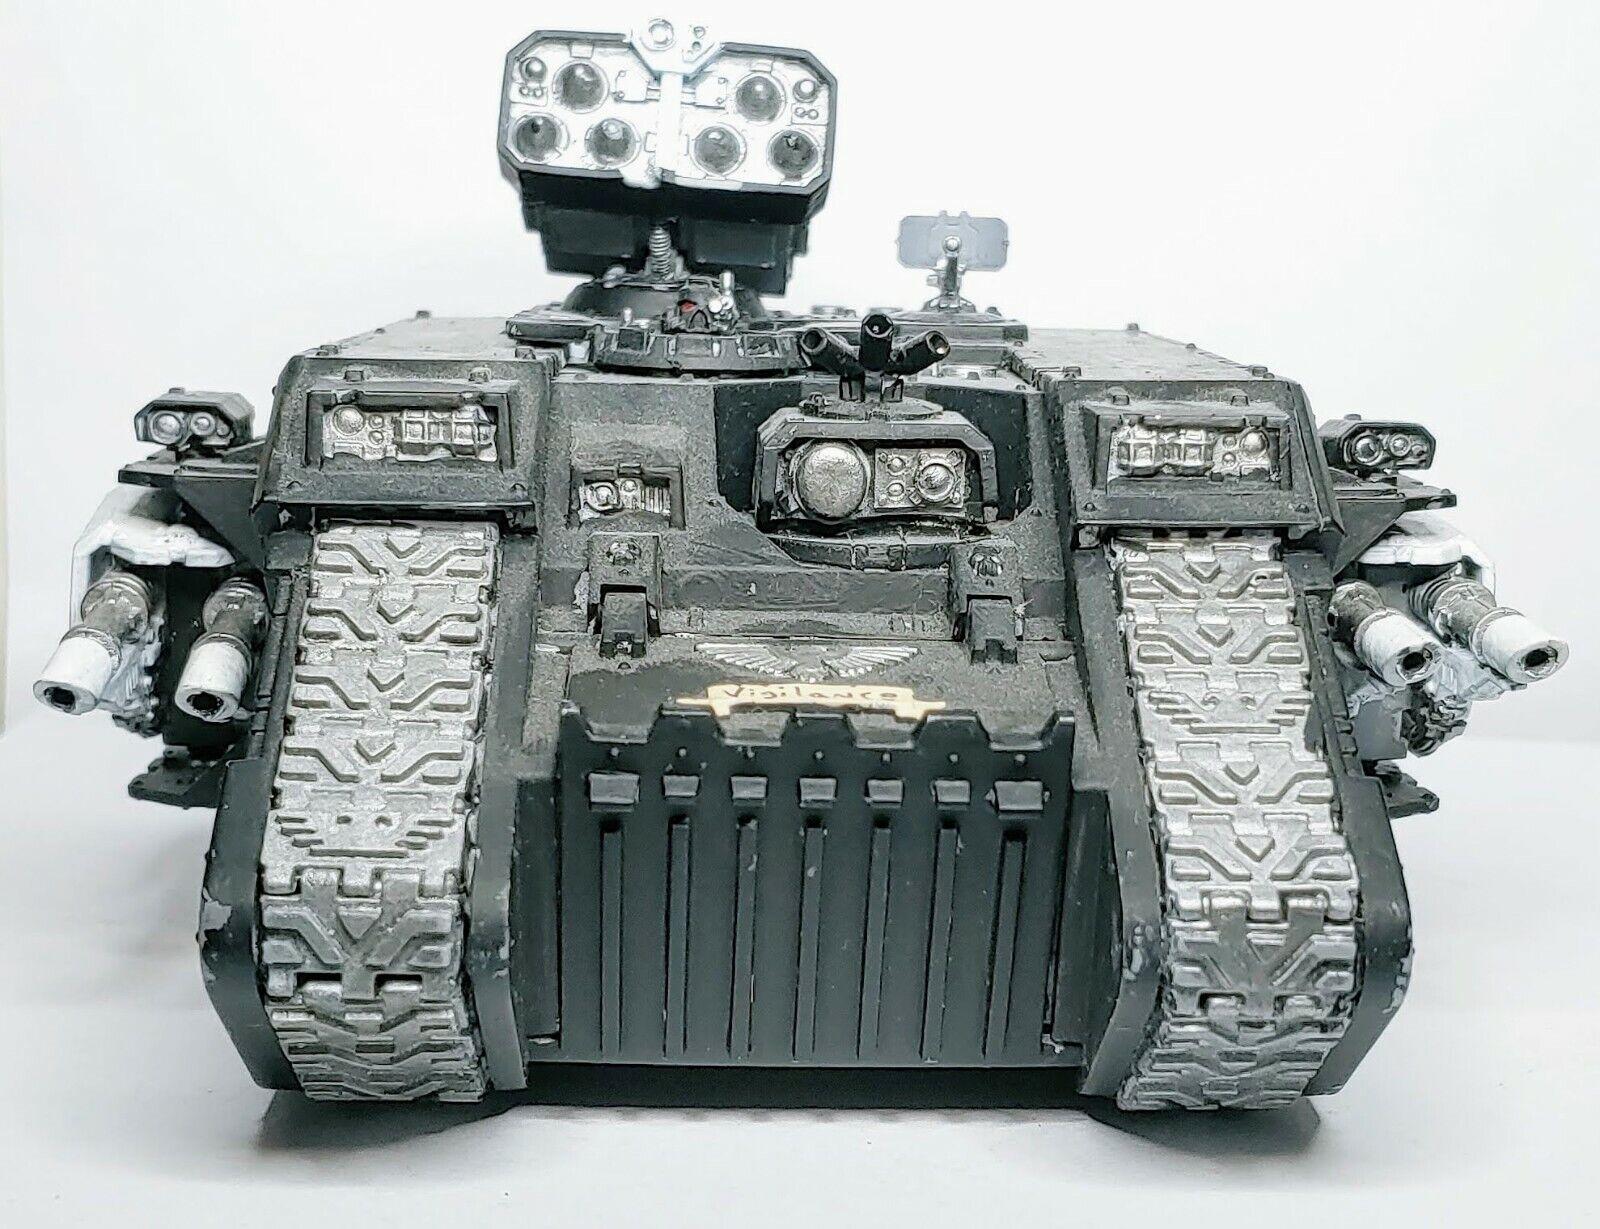 FORGEWORLD Scorpione Rosso Marine Onore Guardia Power Axe-bit 40K